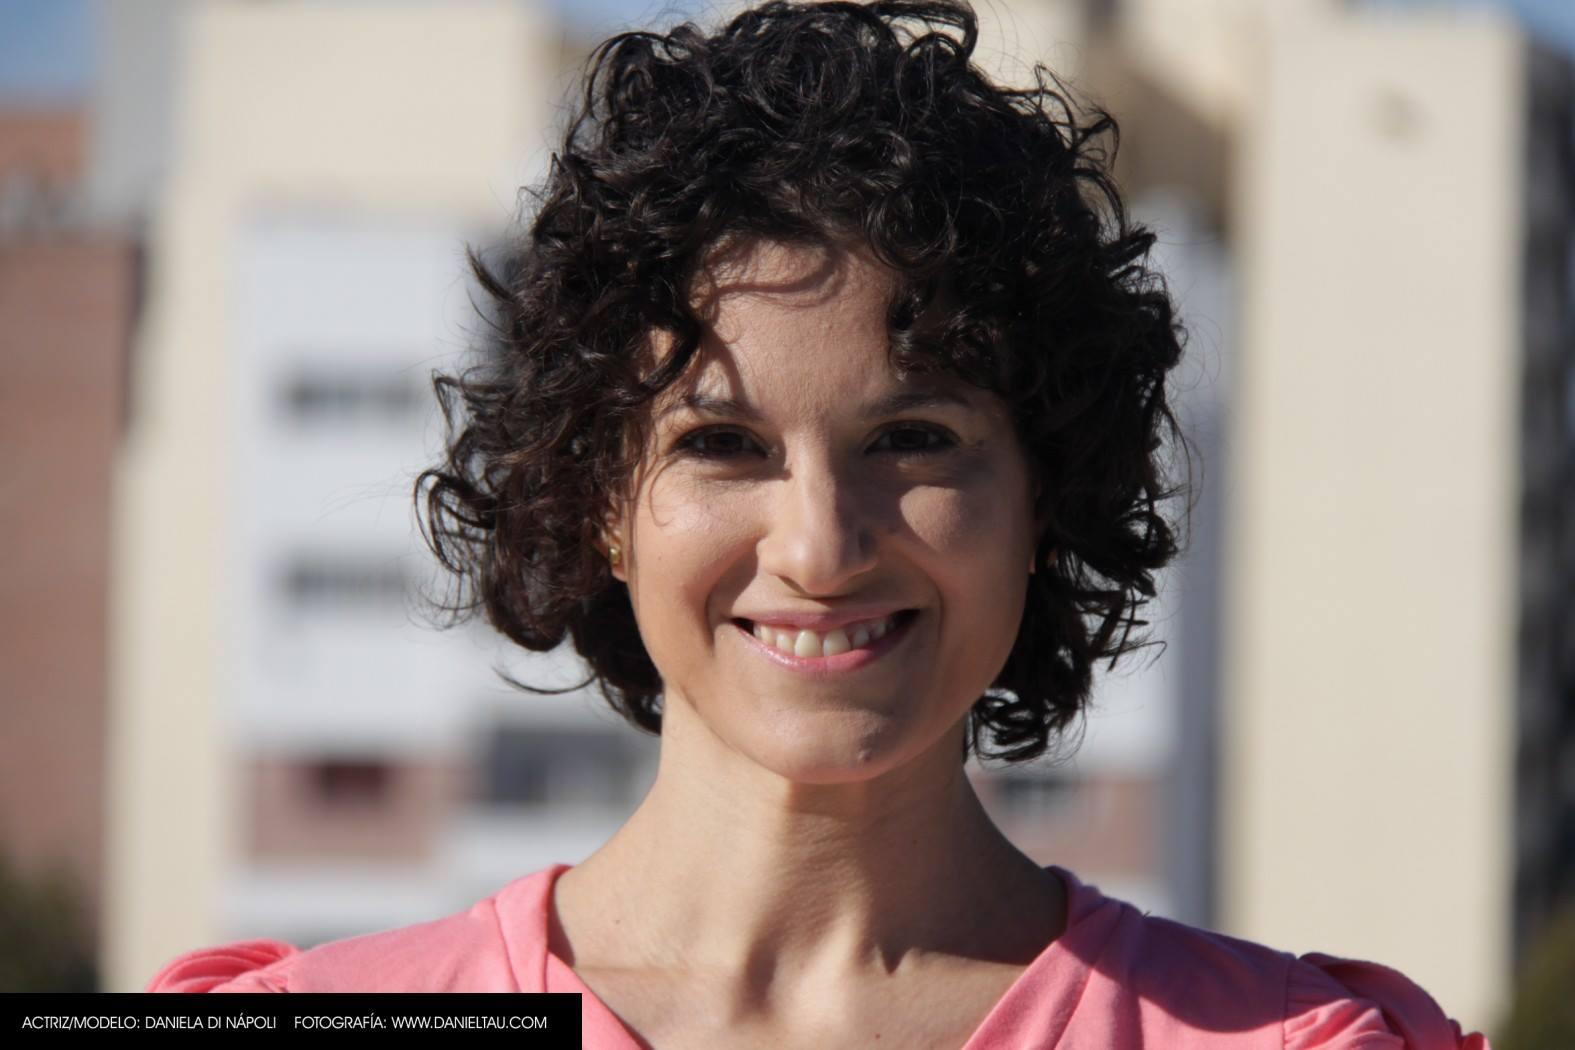 Daniela Di Nápoli